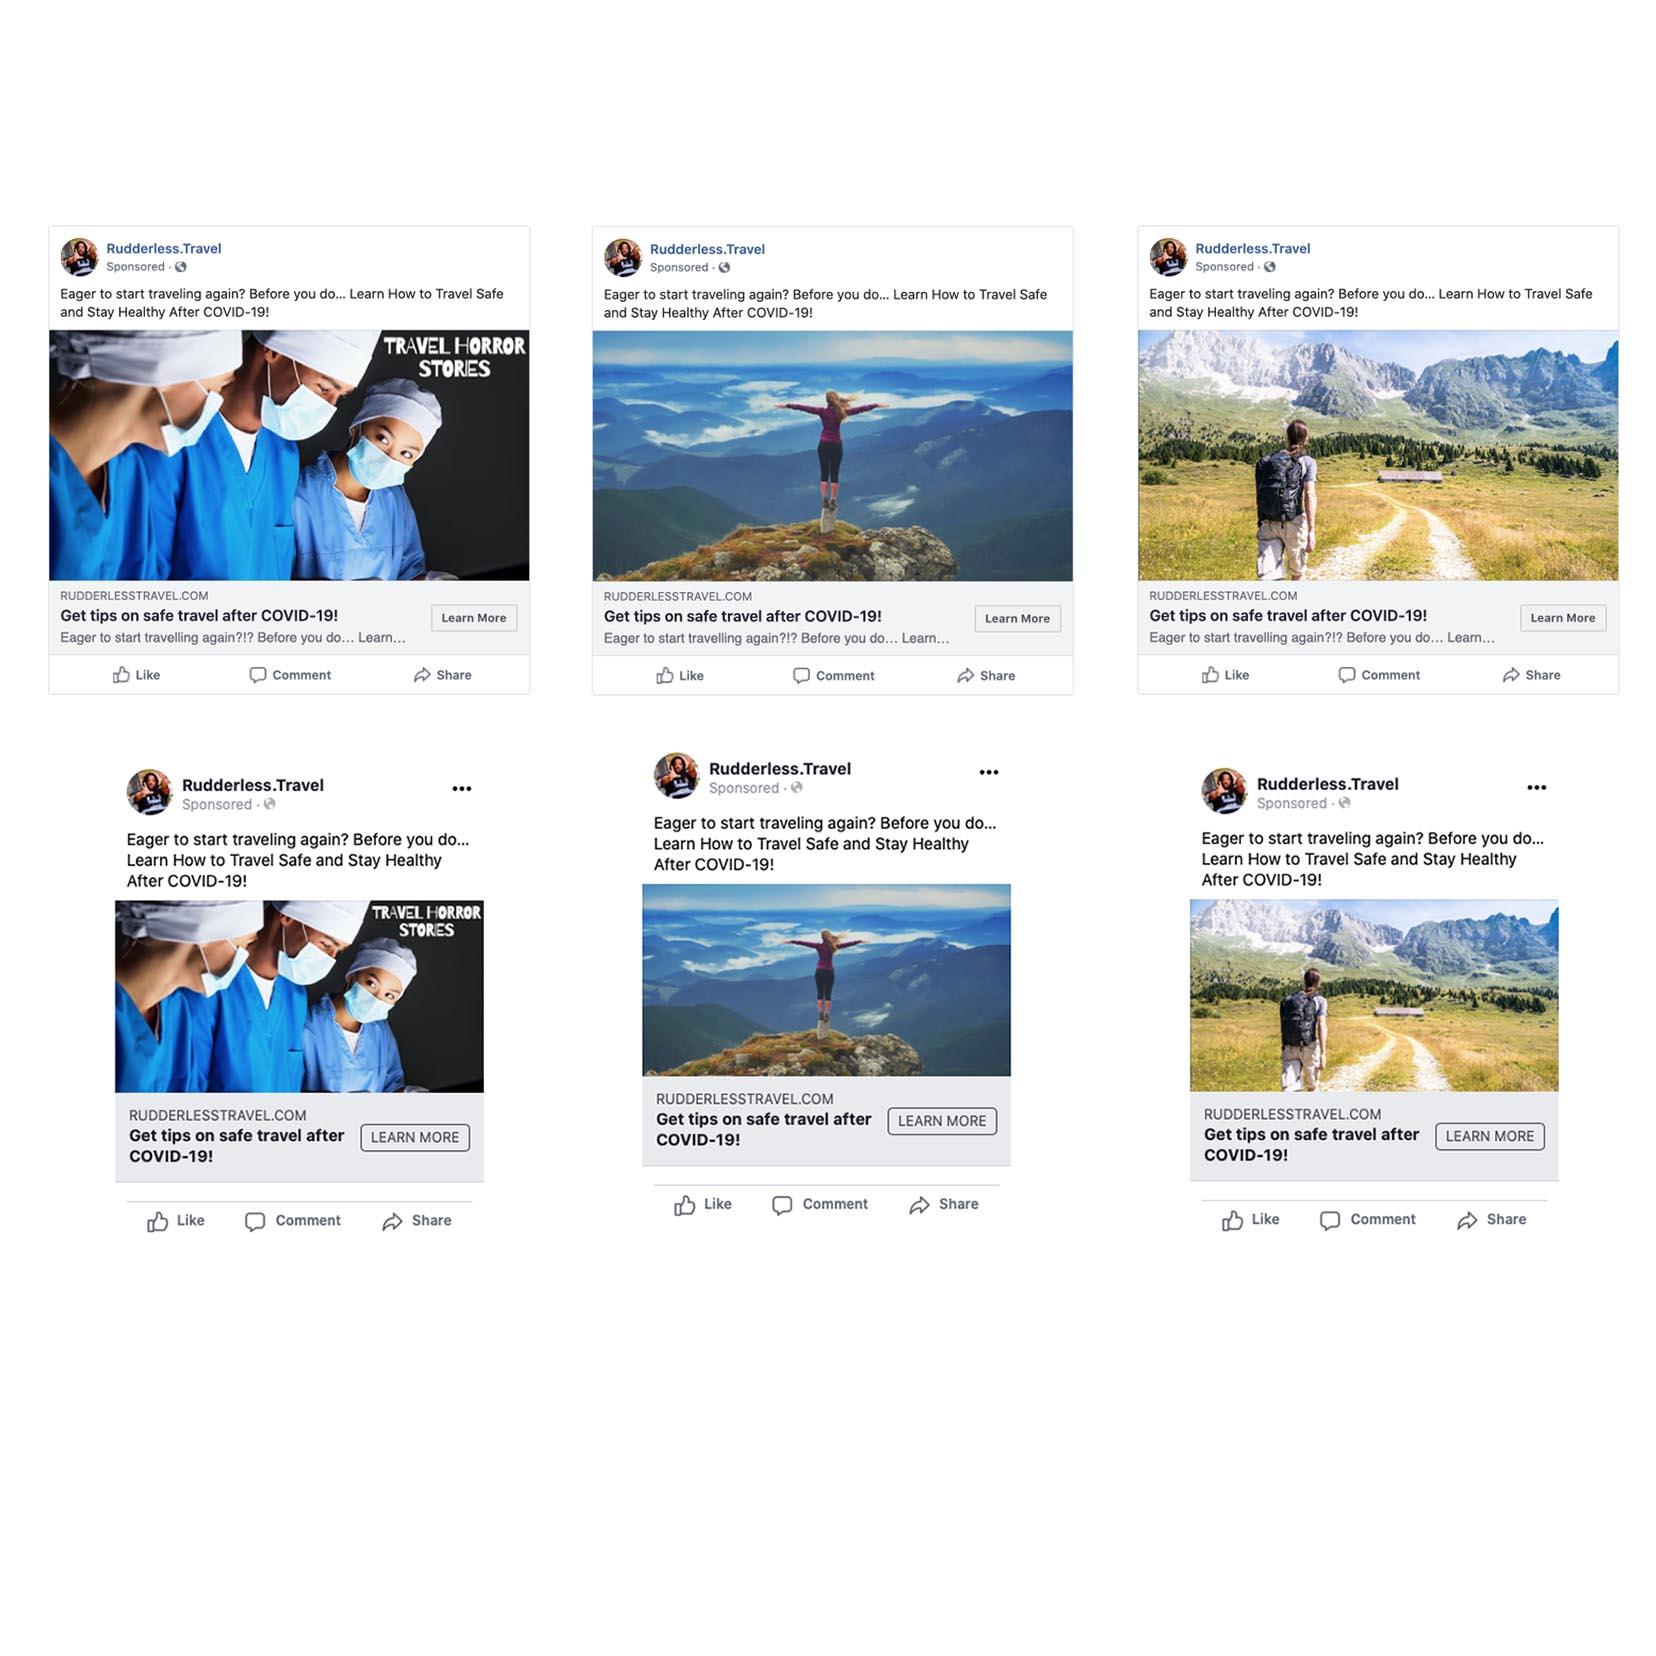 Rudderless Travel - Digital Ads